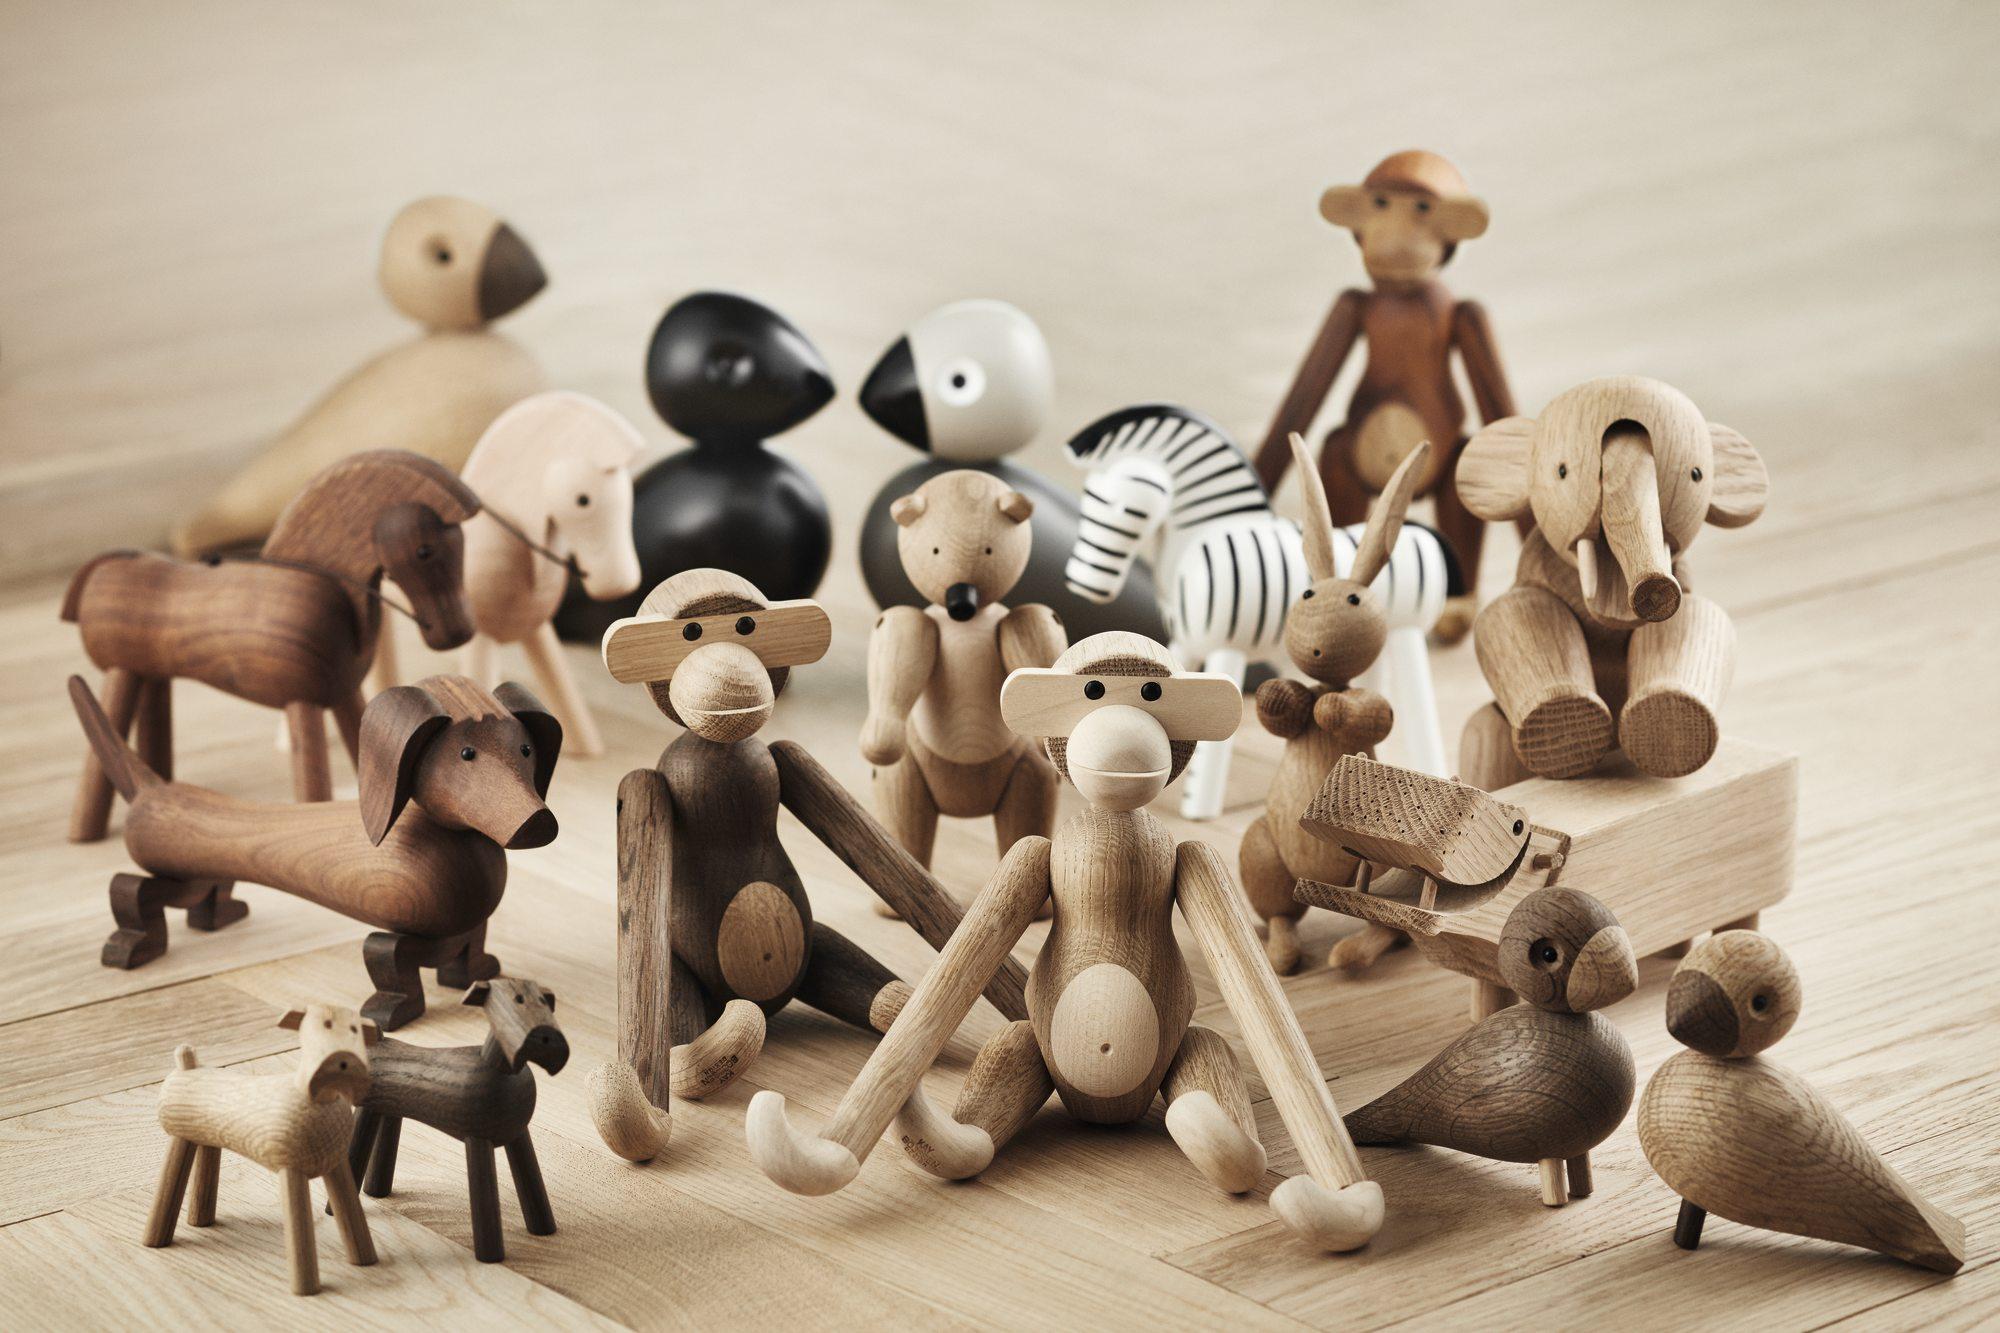 Affe klein Holzfigur Eiche geräuchert Kay Bojesen